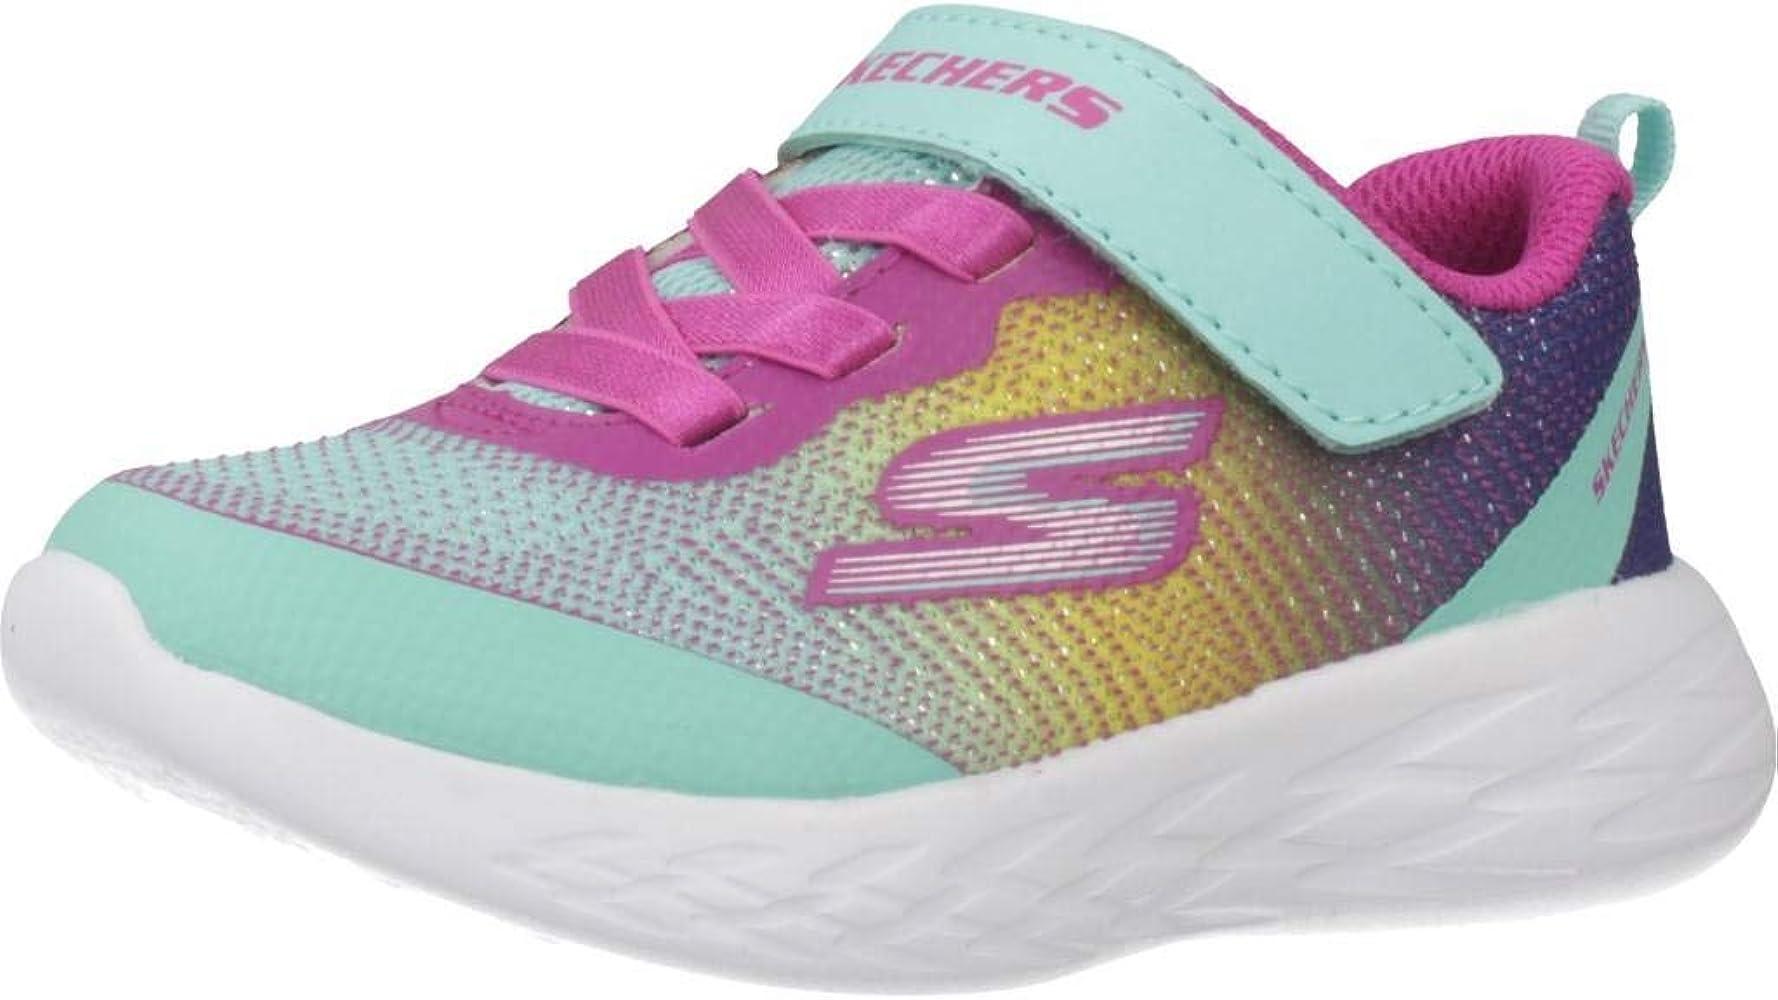 classic fit innovative design factory price Kids Girl's GO Run 600-DAZZLE STRIDES Shoe, Turquoise/Multi, 6 Medium US  Toddler